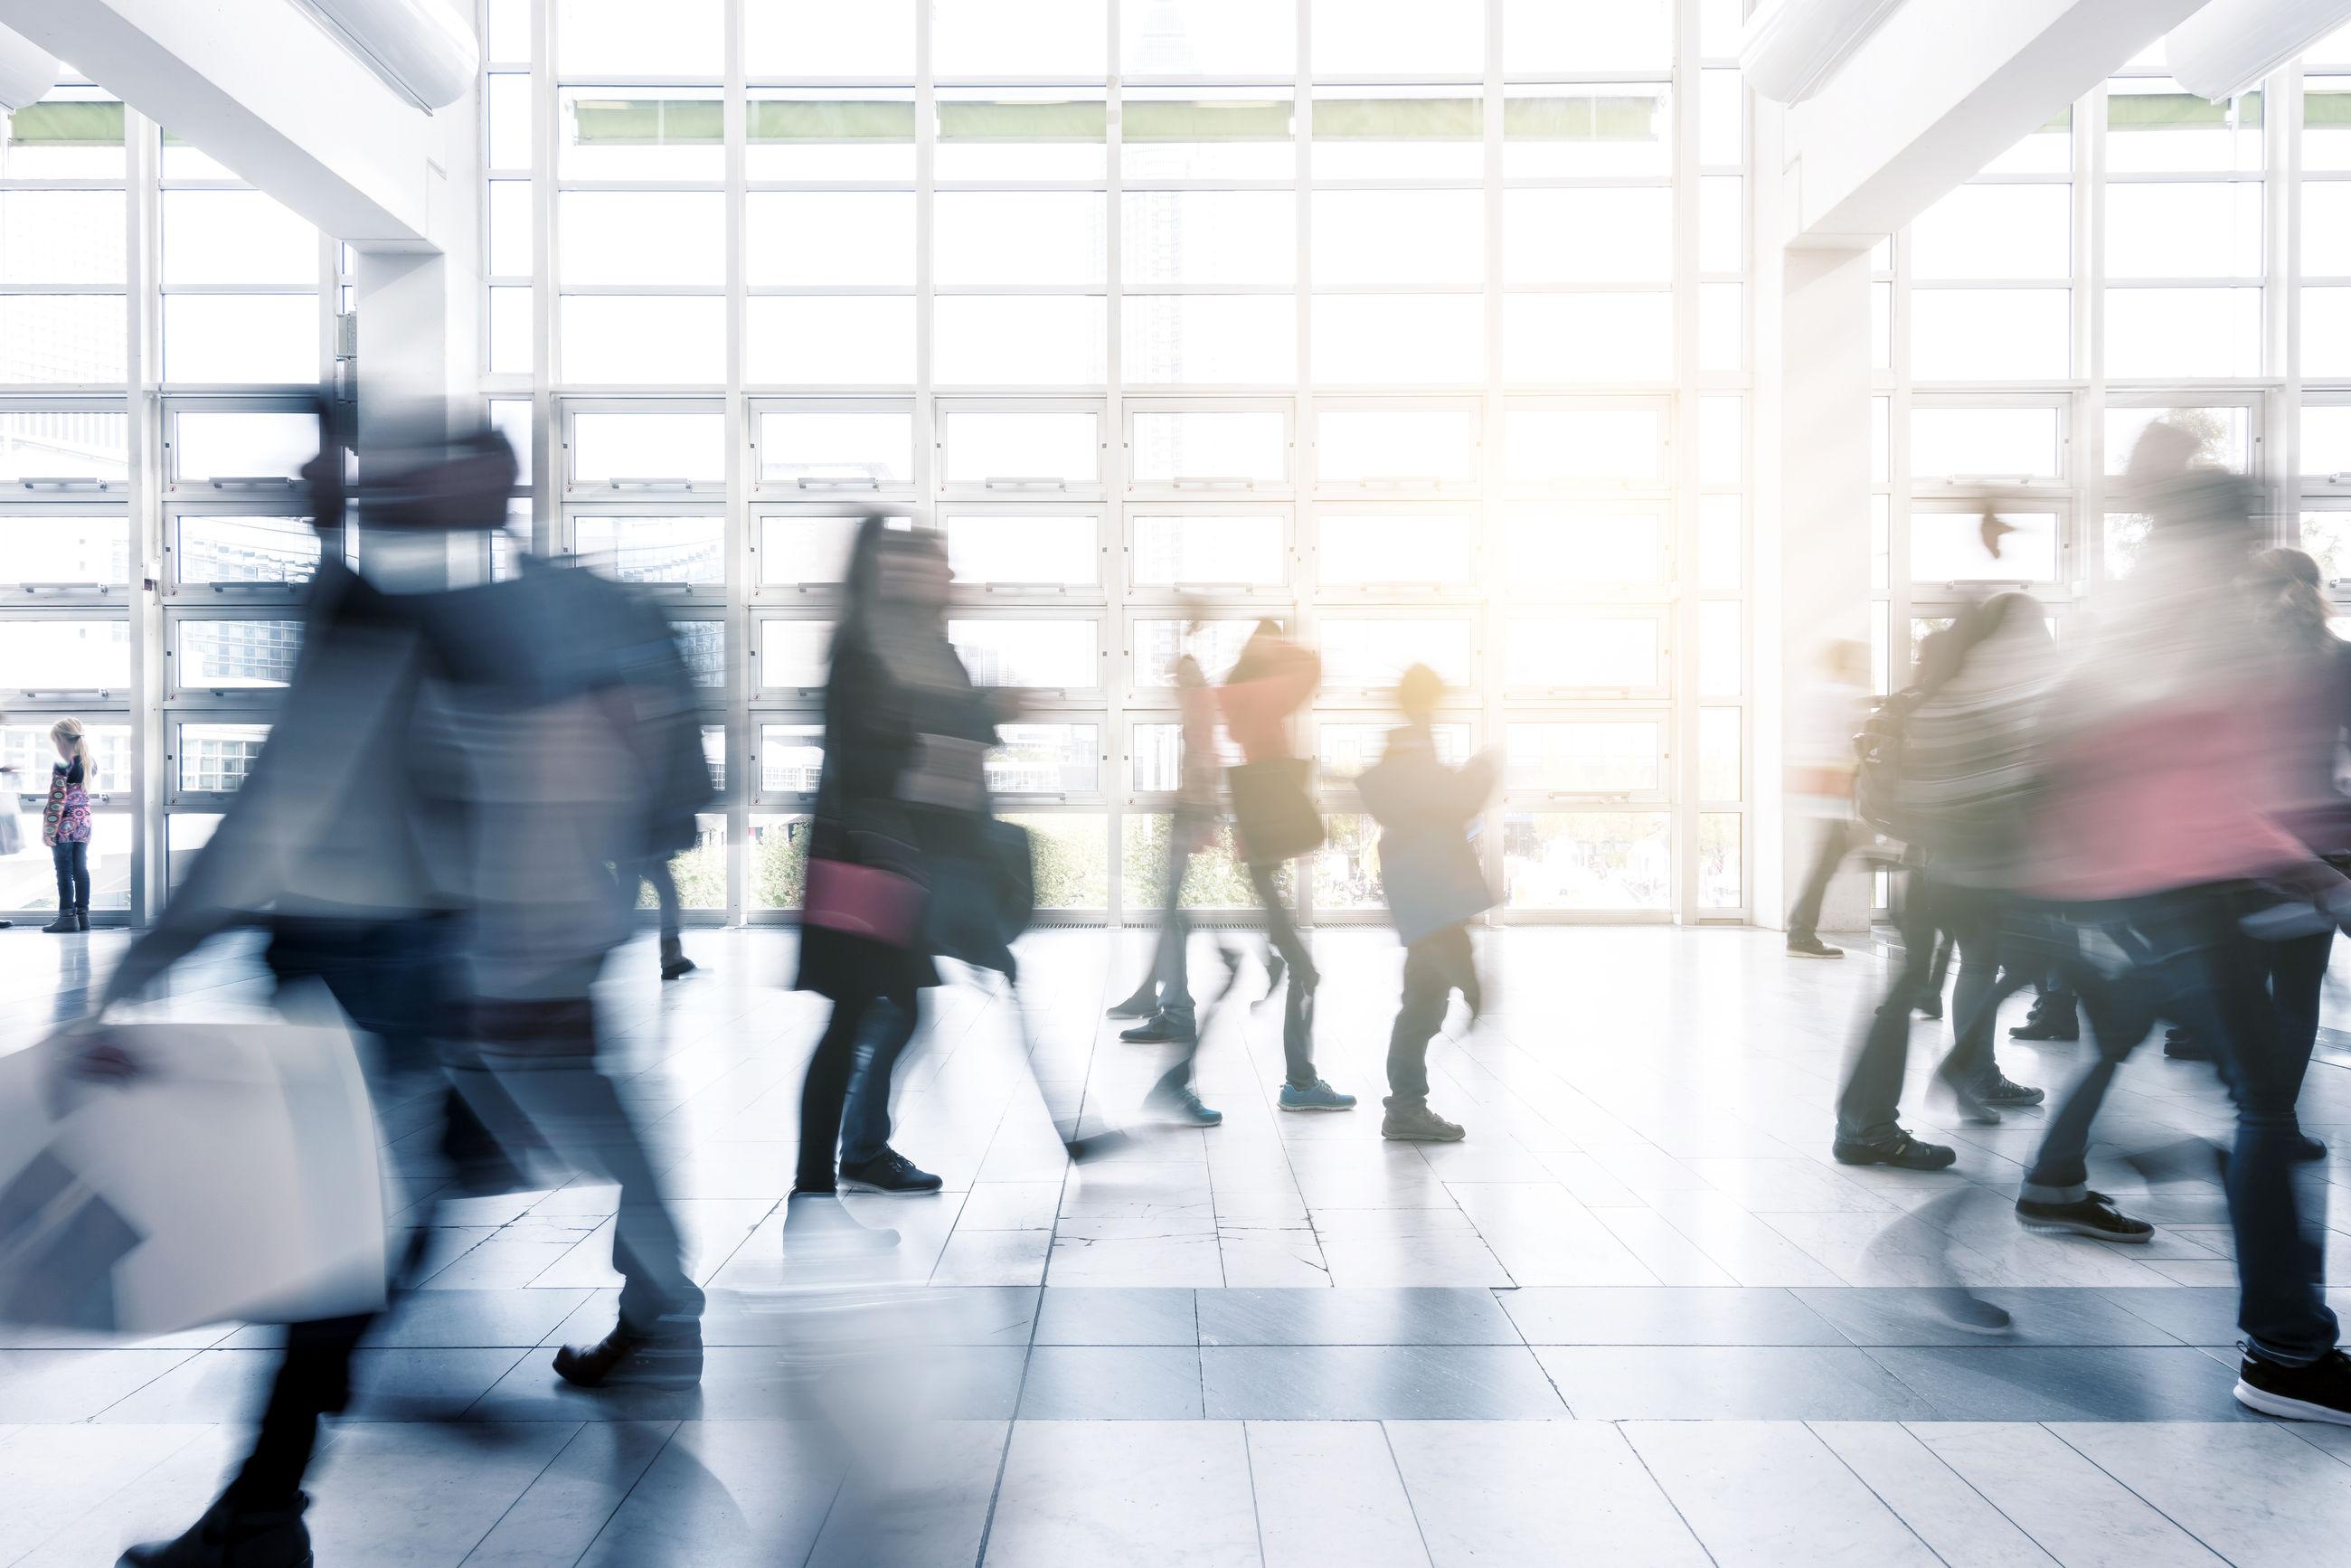 Blurred motion of people walking in modern office building